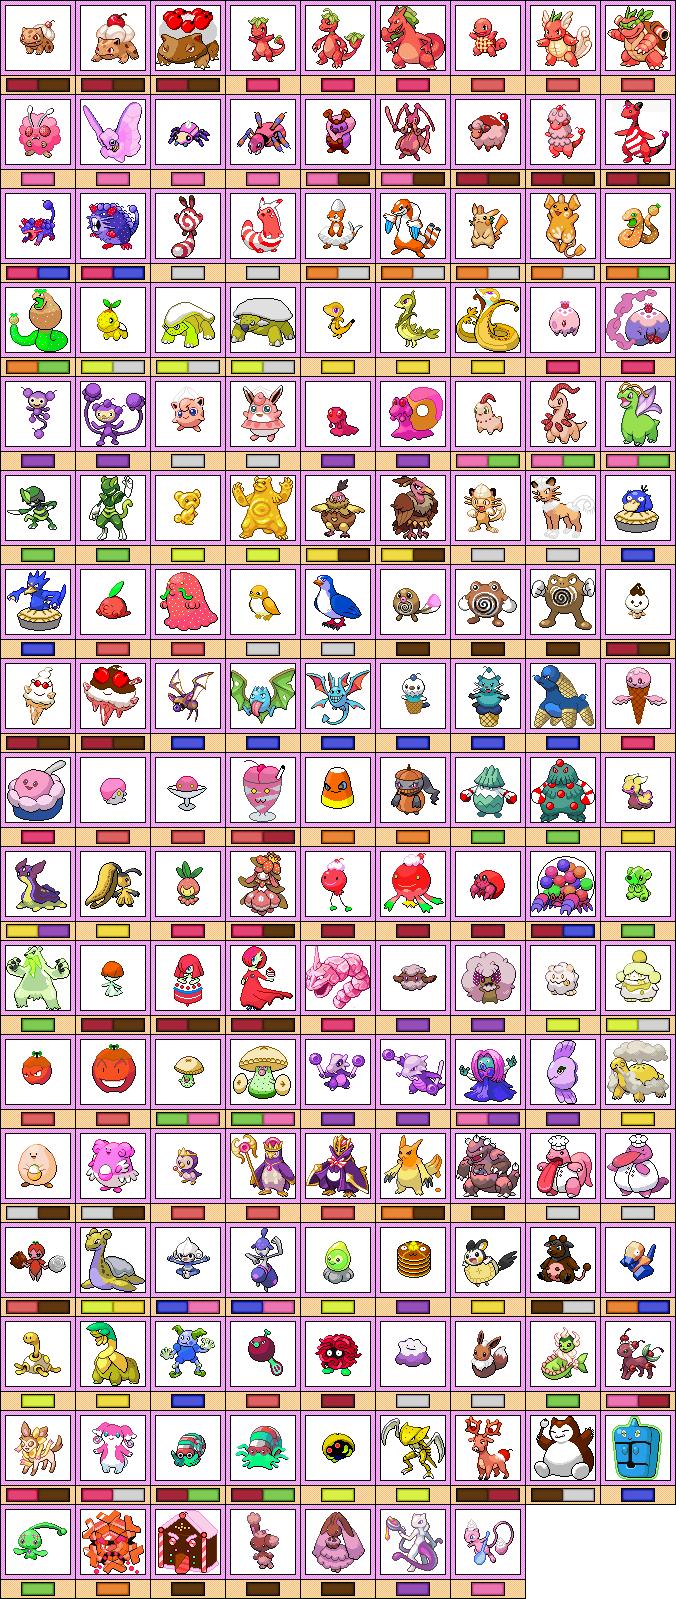 Pokemon Sweet Cookbook By Krocf4 On Deviantart